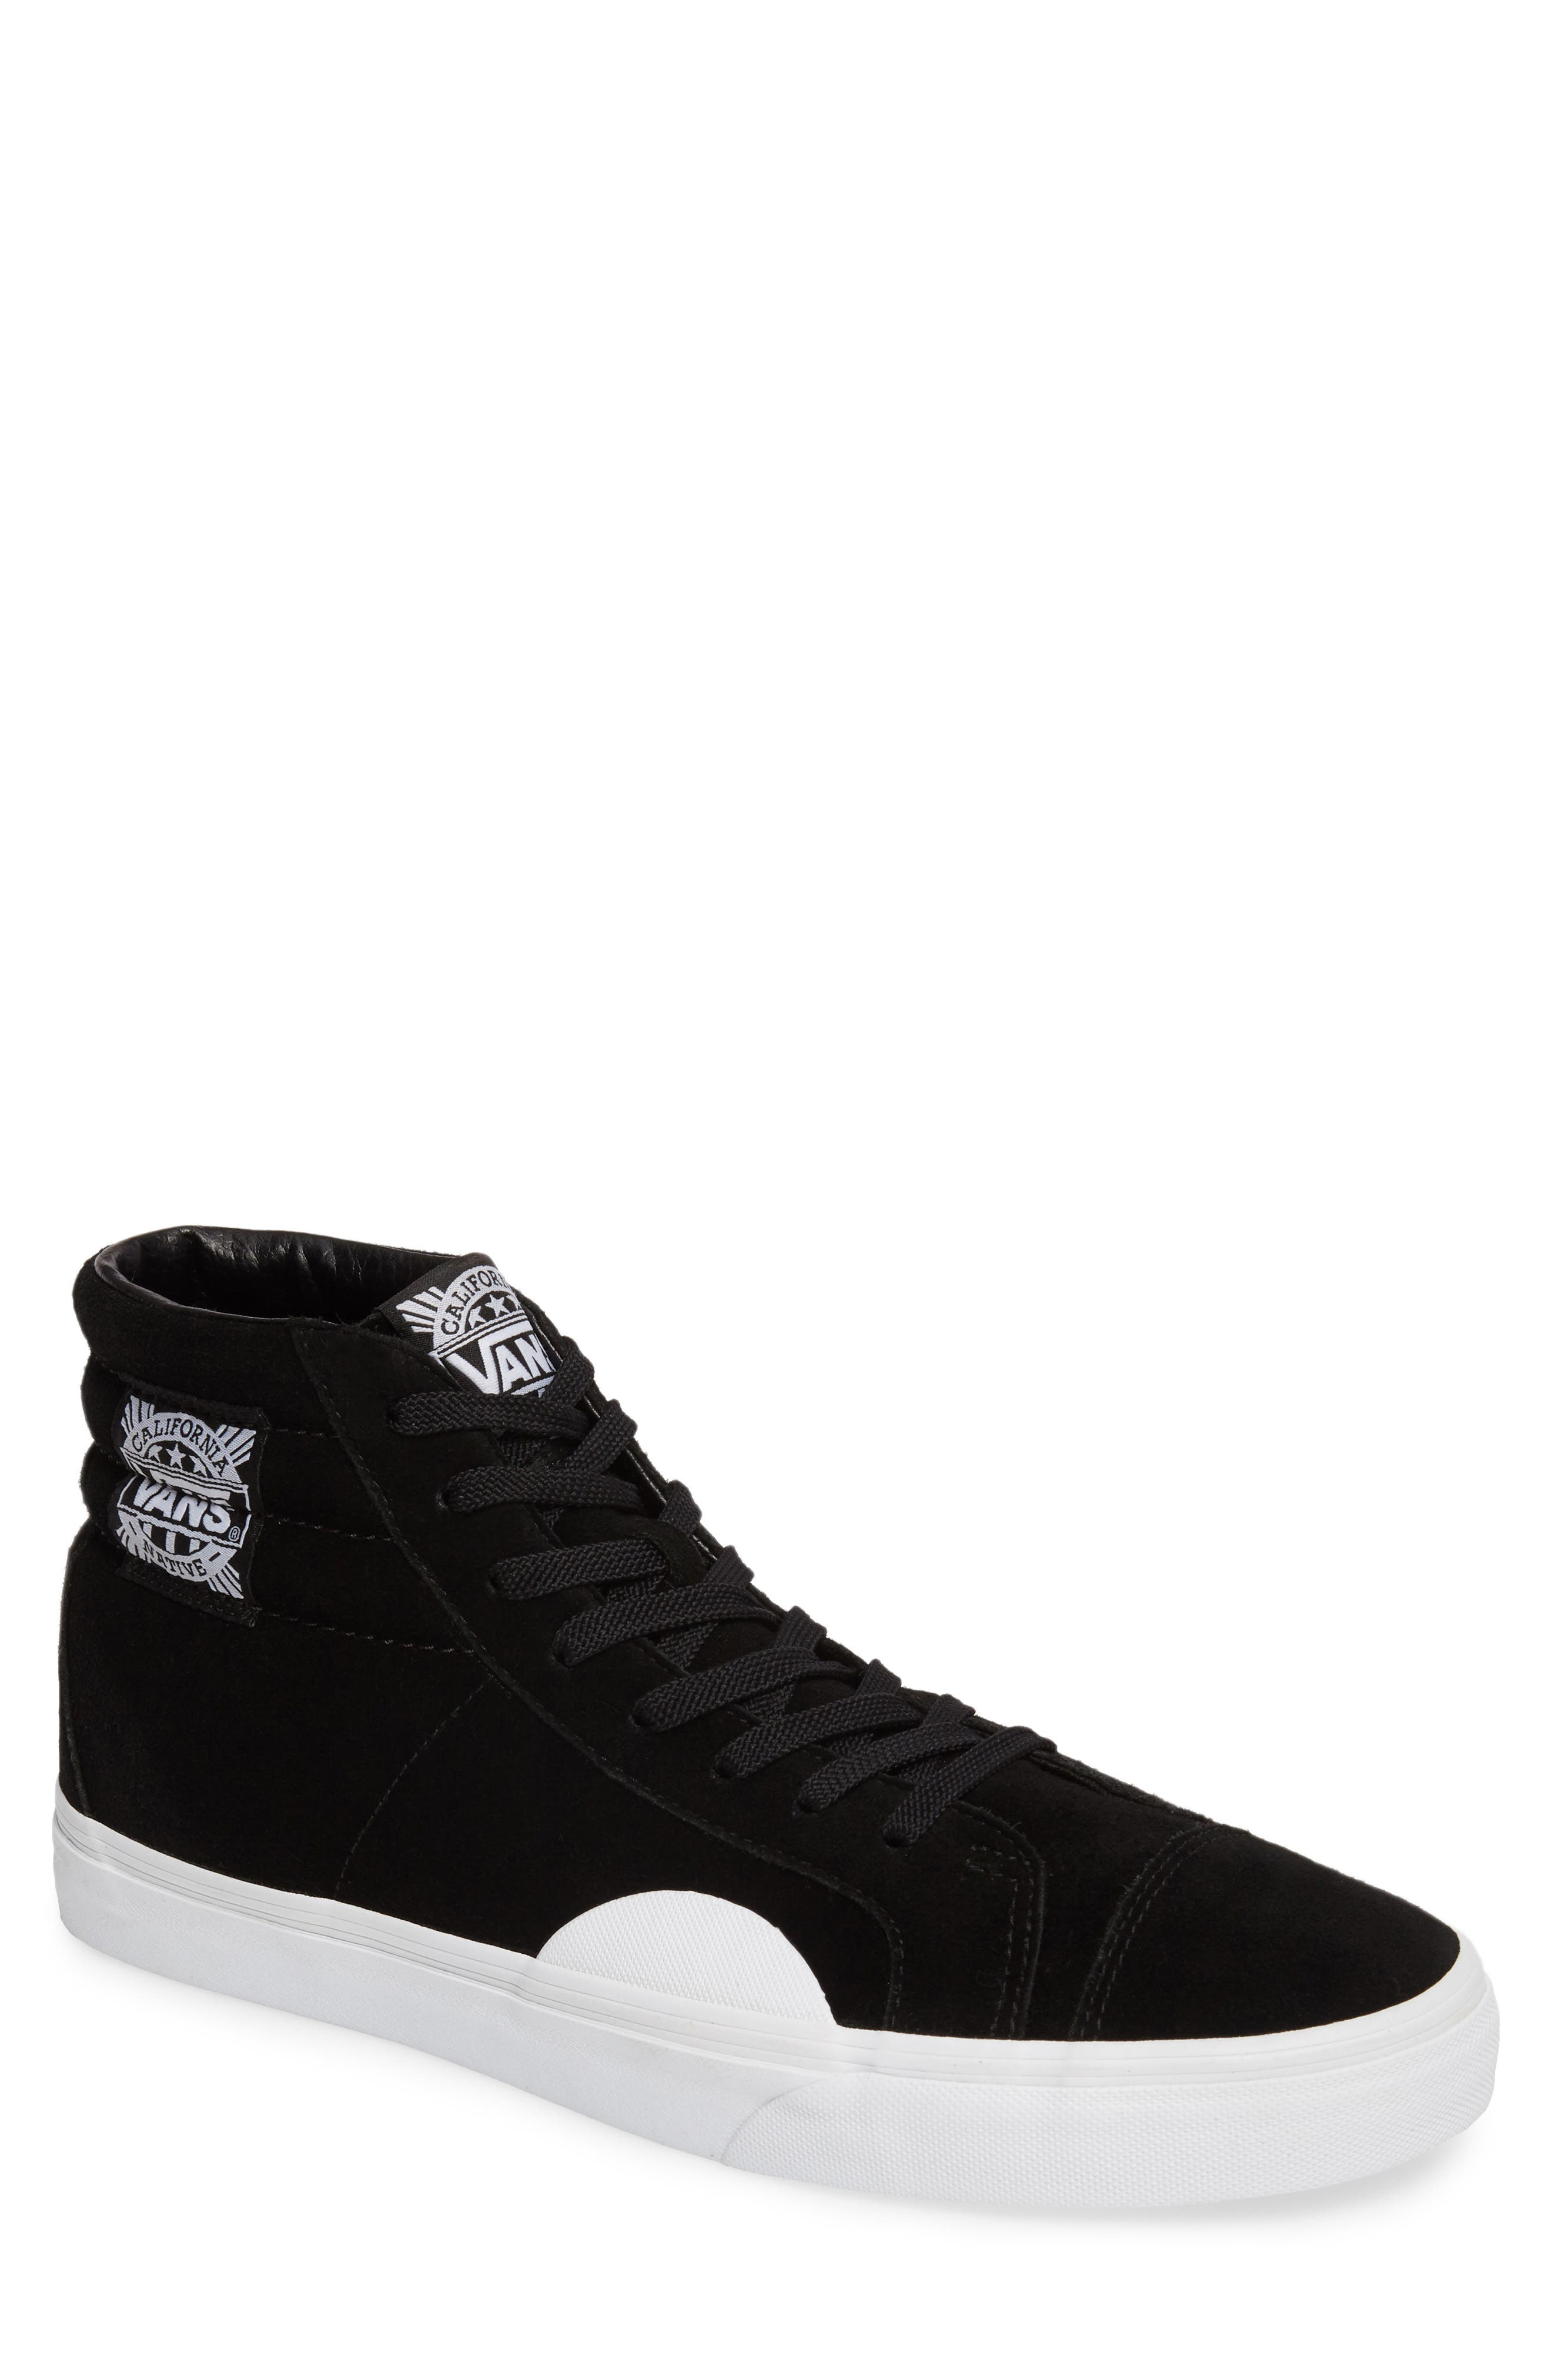 Style 238 Sneaker,                             Main thumbnail 1, color,                             001